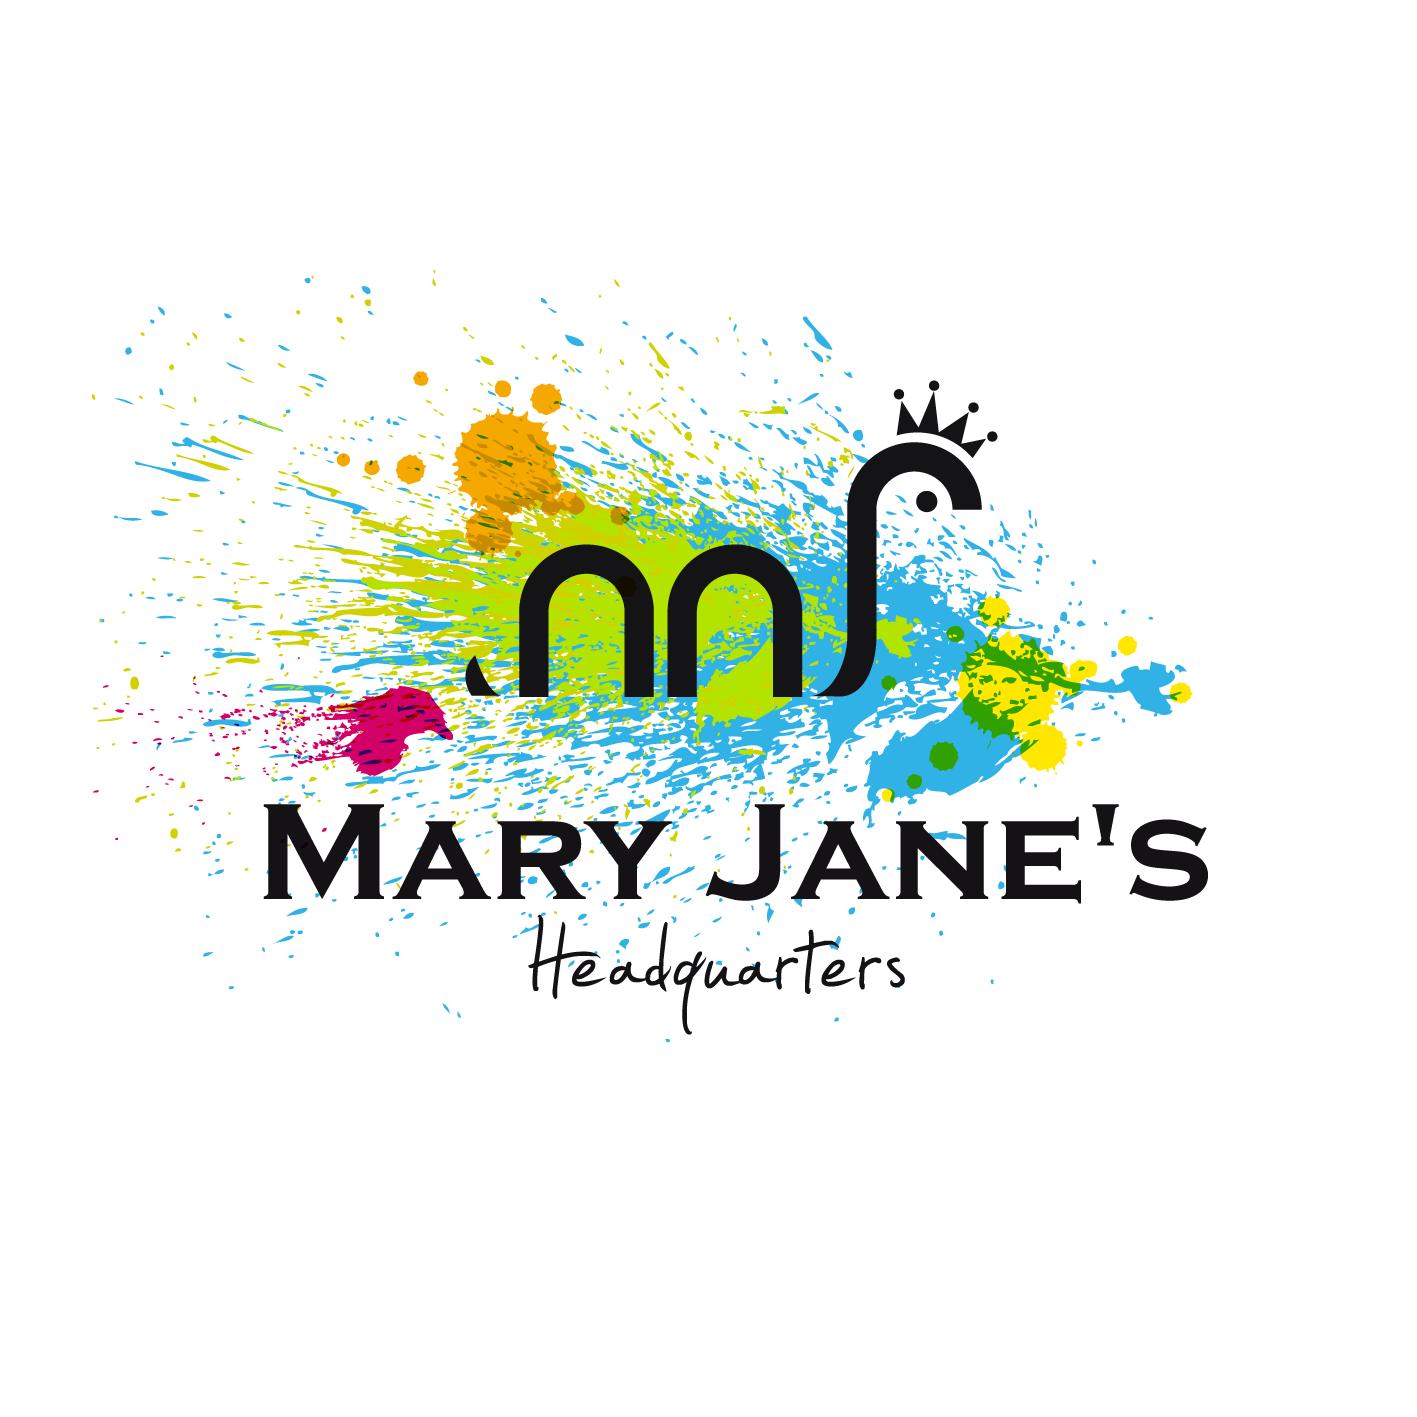 Logo Design by luna - Entry No. 41 in the Logo Design Contest Mary Jane's Headquarters Logo Design.